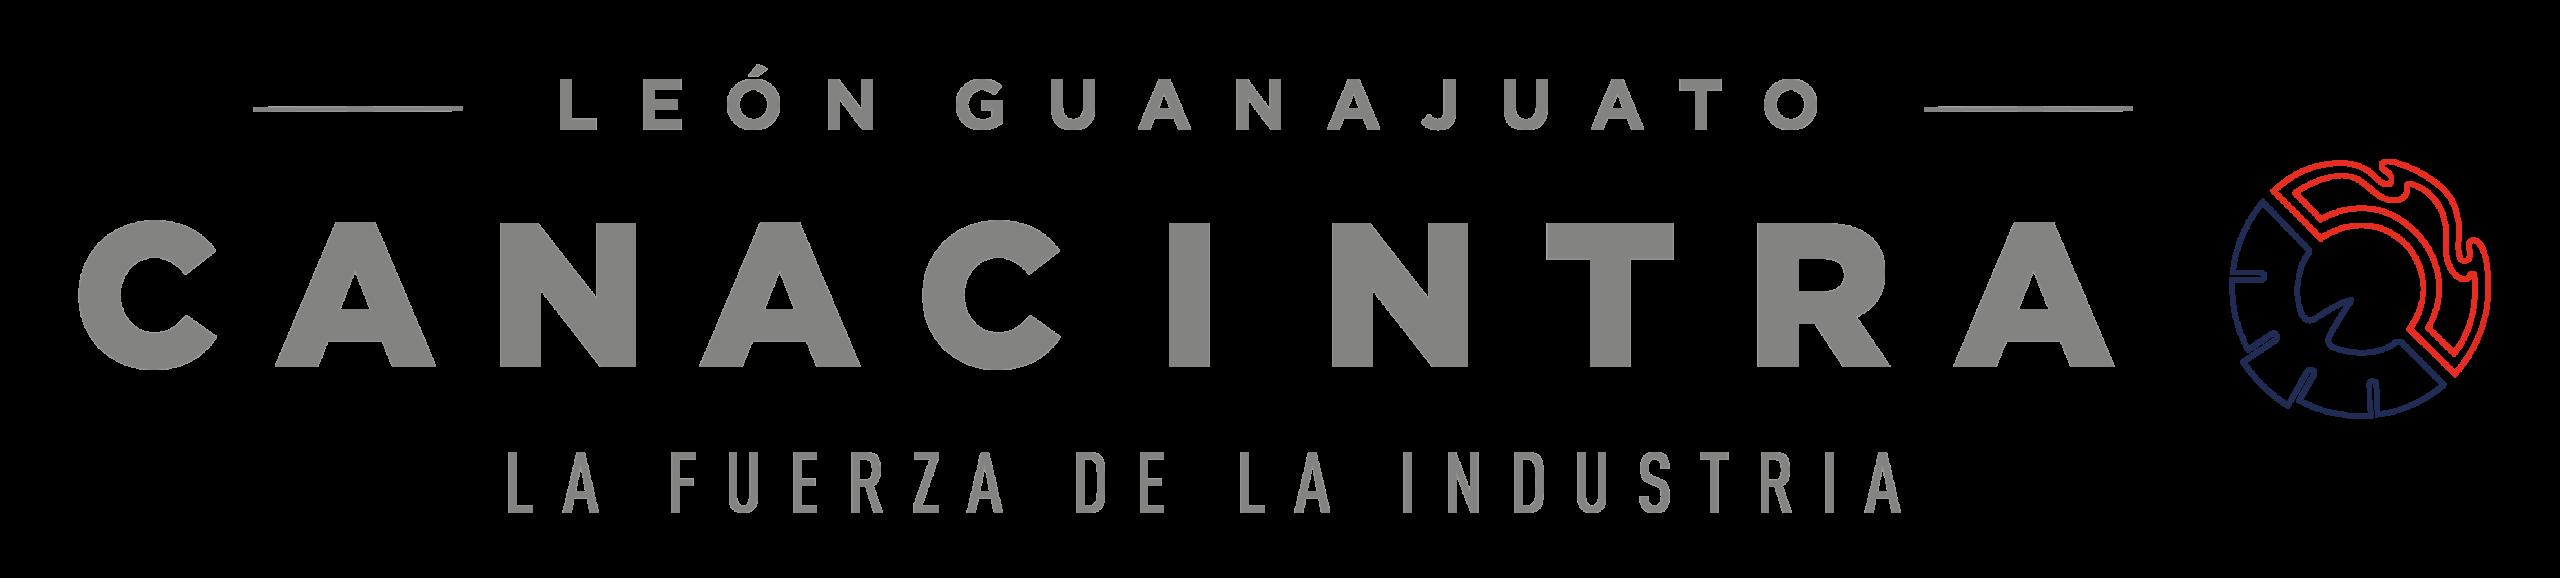 Canacintra León